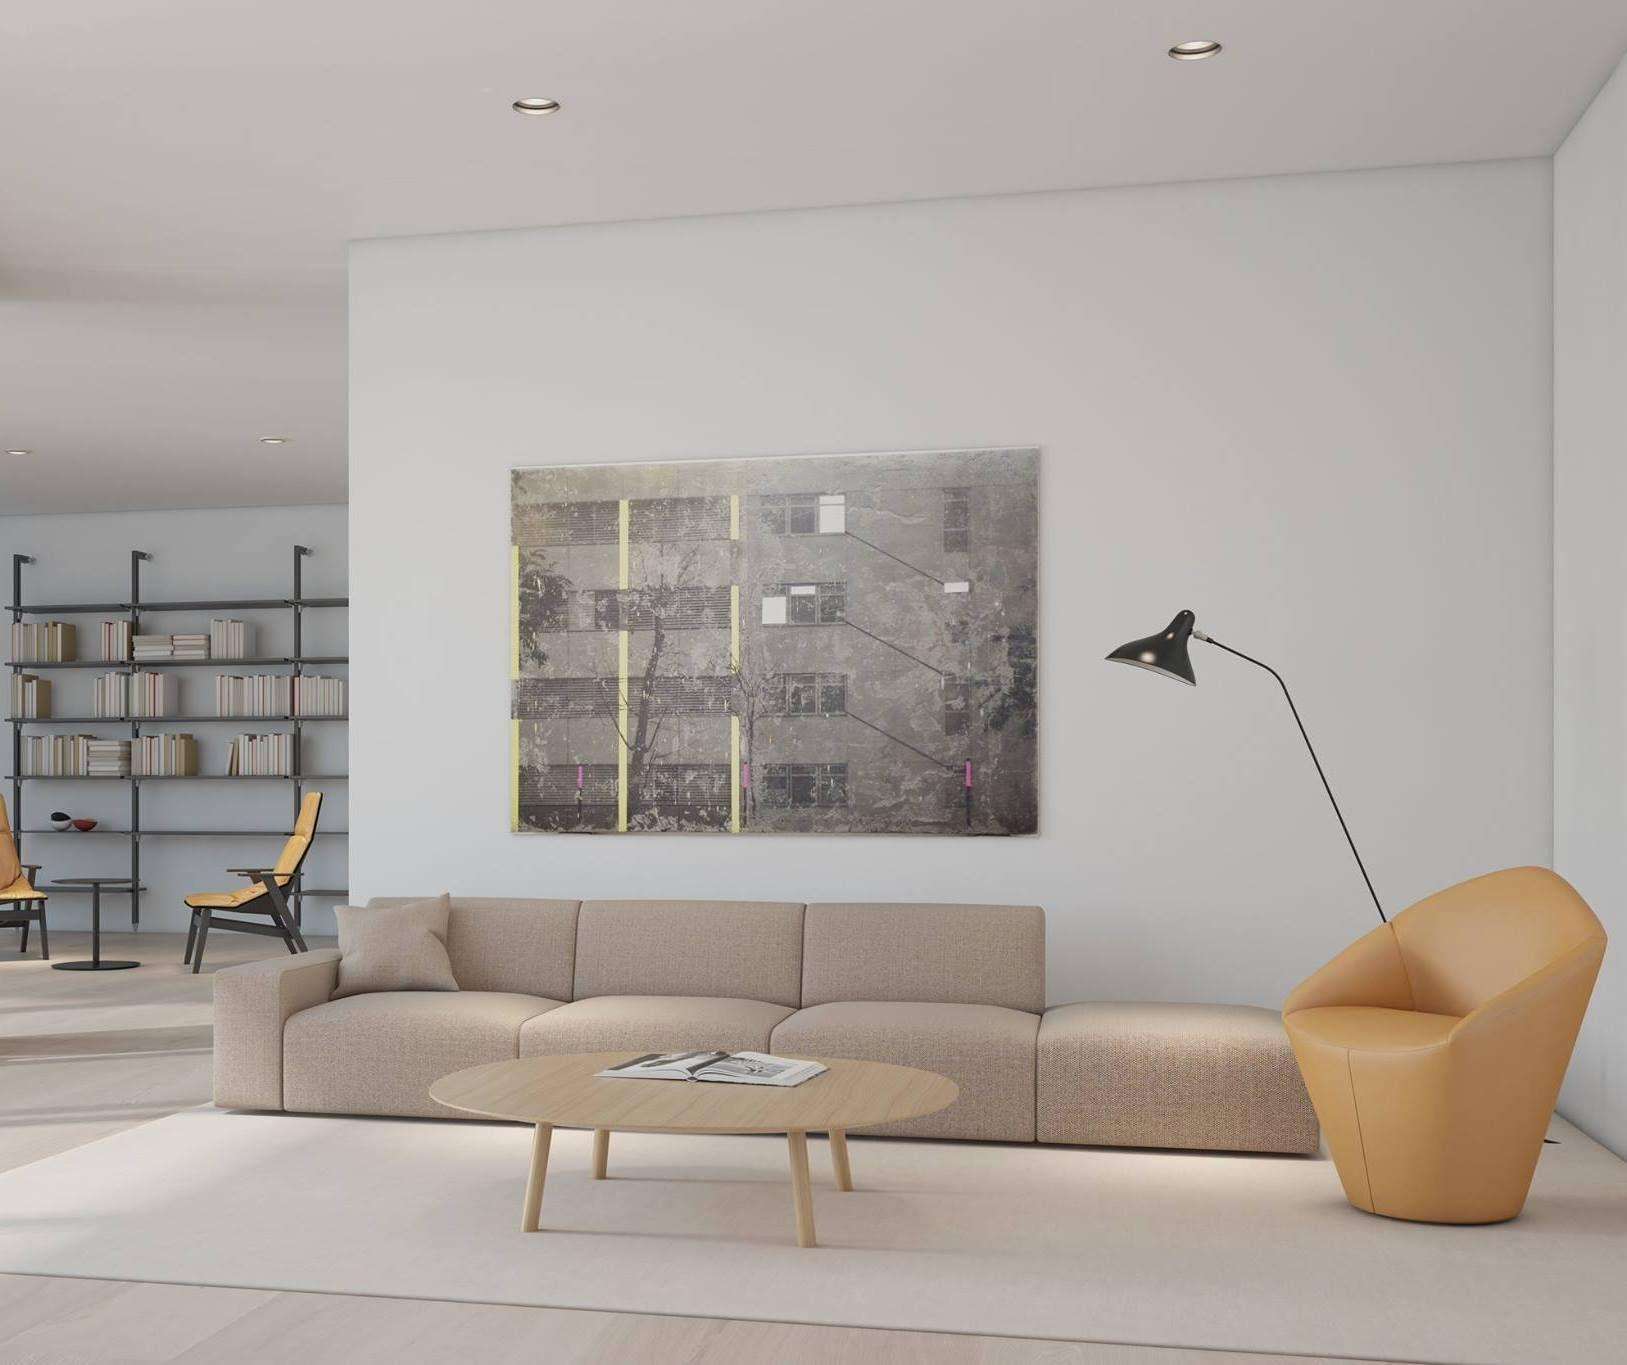 Mejores 14 Im Genes De Selekcia Tt En Pinterest Arquitectos  # Muebles Cedros Esplugues